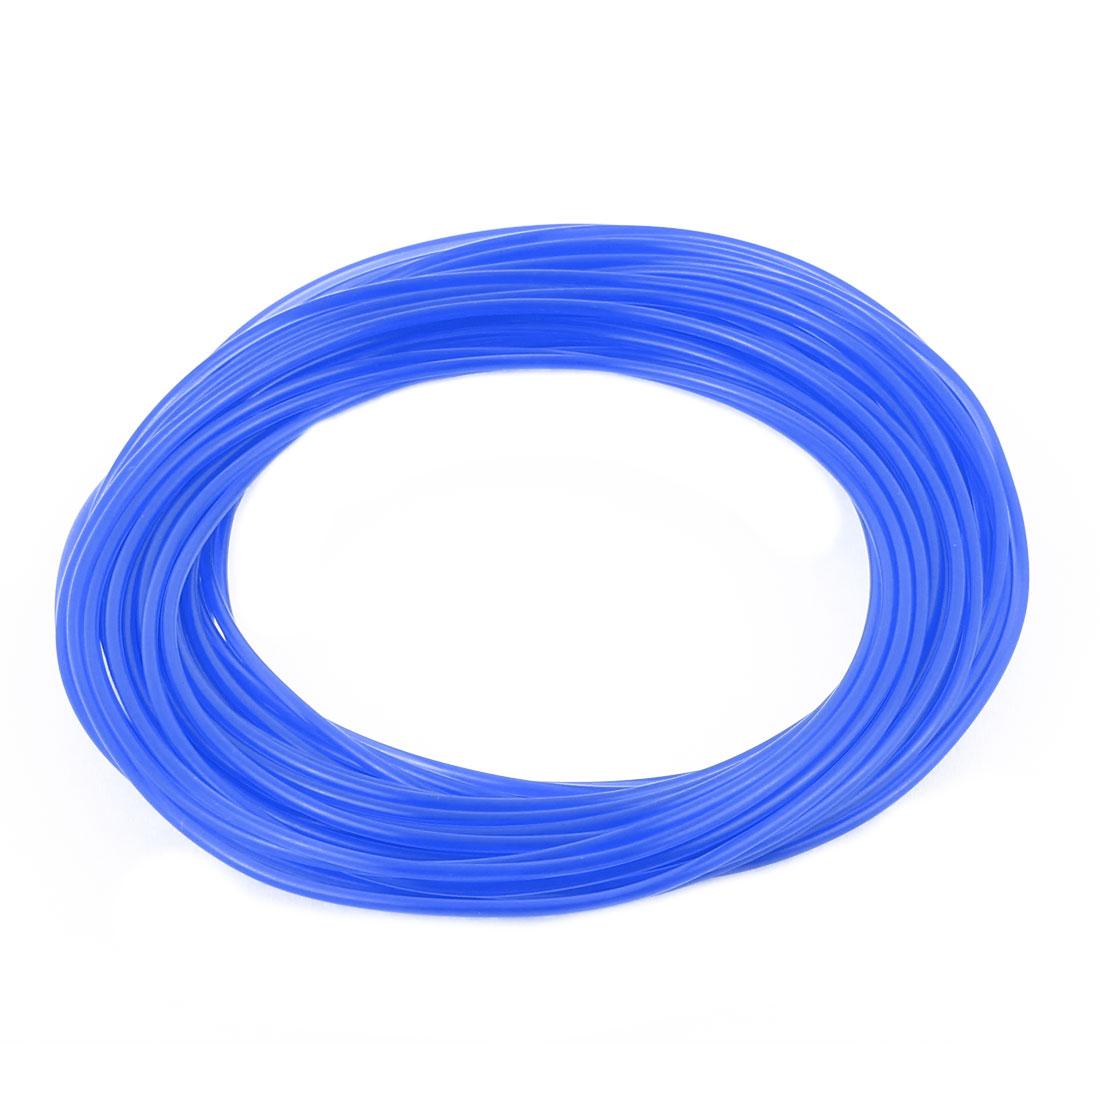 10m 3D Printer Pen Painting Filament Refills PLA Printing Material Transparent Blue